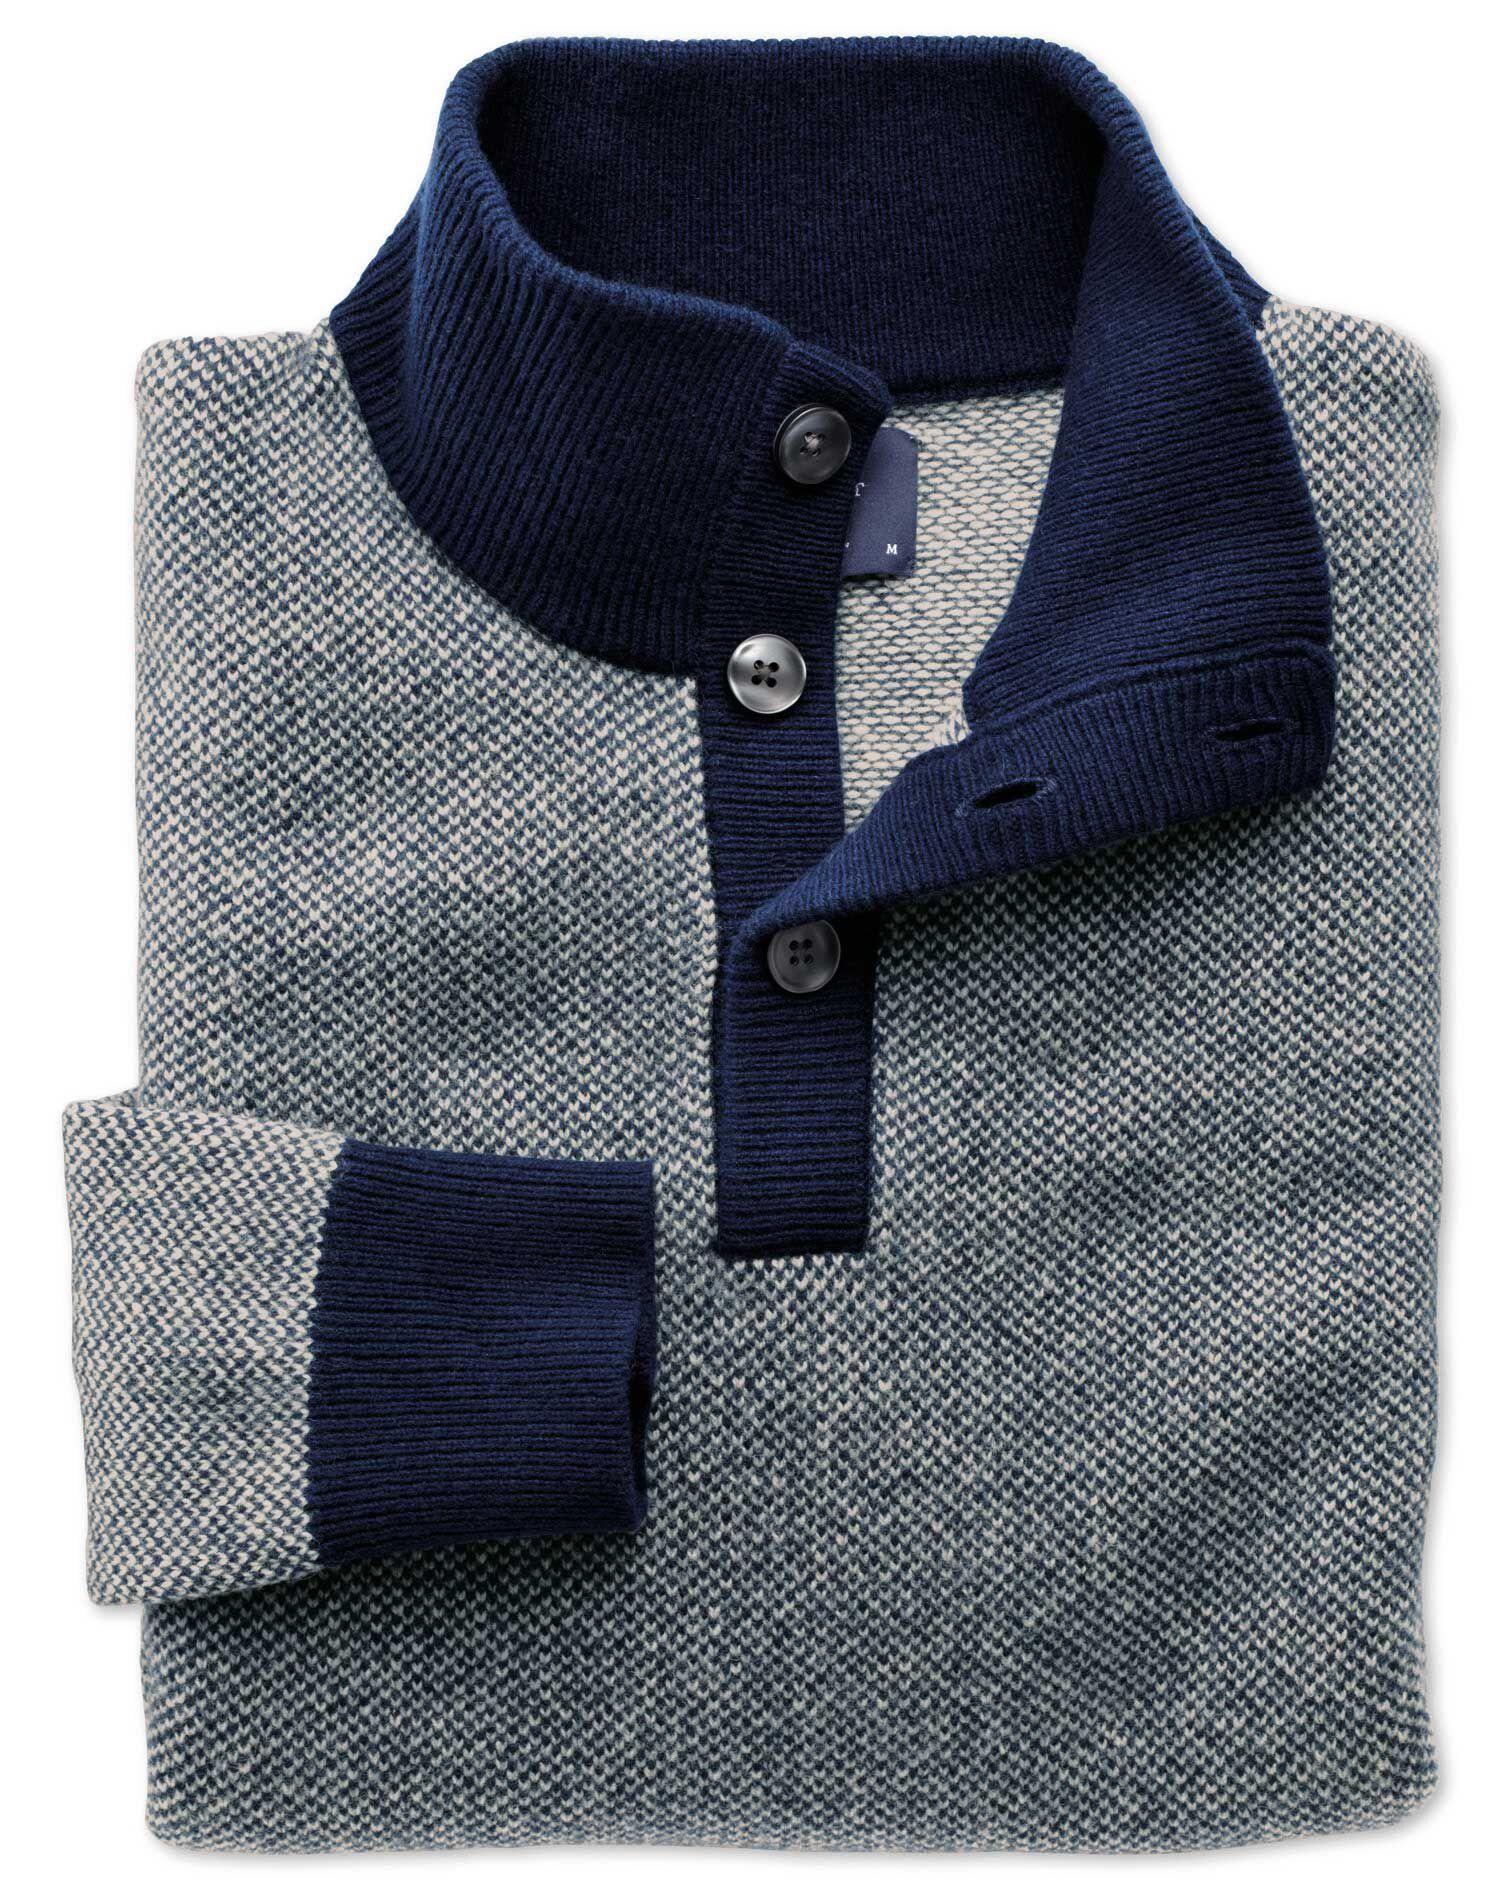 Blue Jacquard Button Neck Wool Jumper Size XXXL by Charles Tyrwhitt